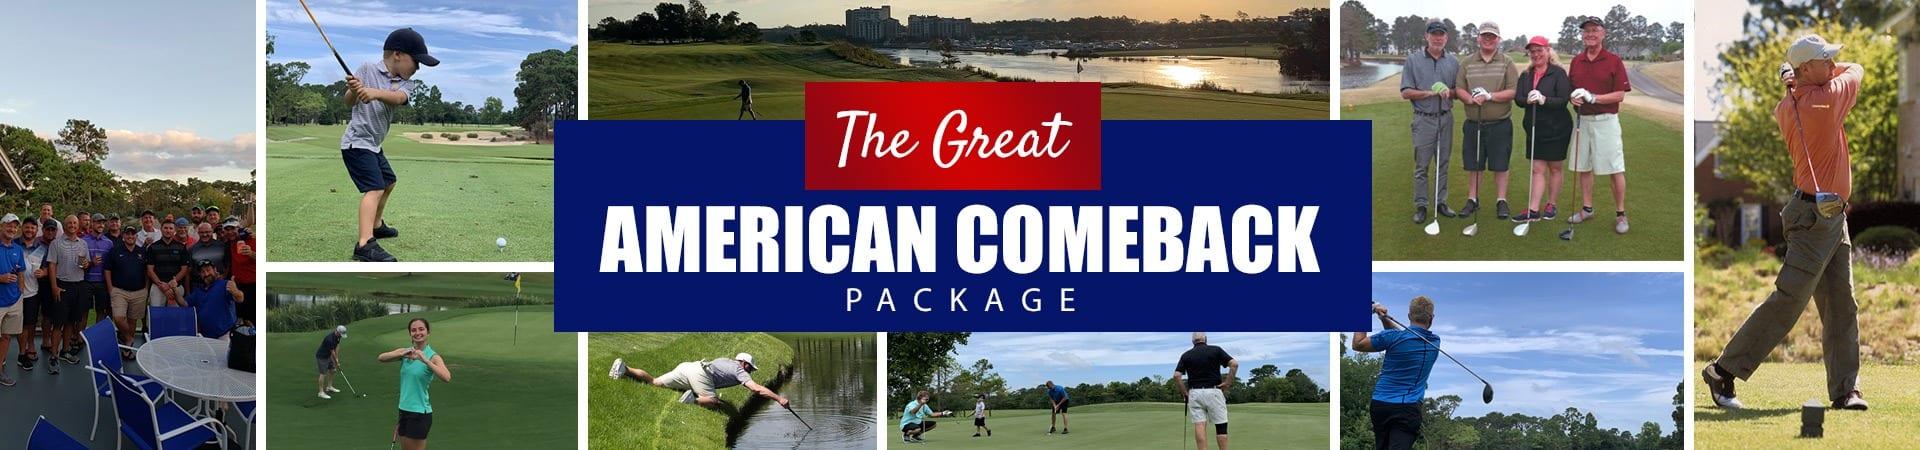 The Great American Comeback